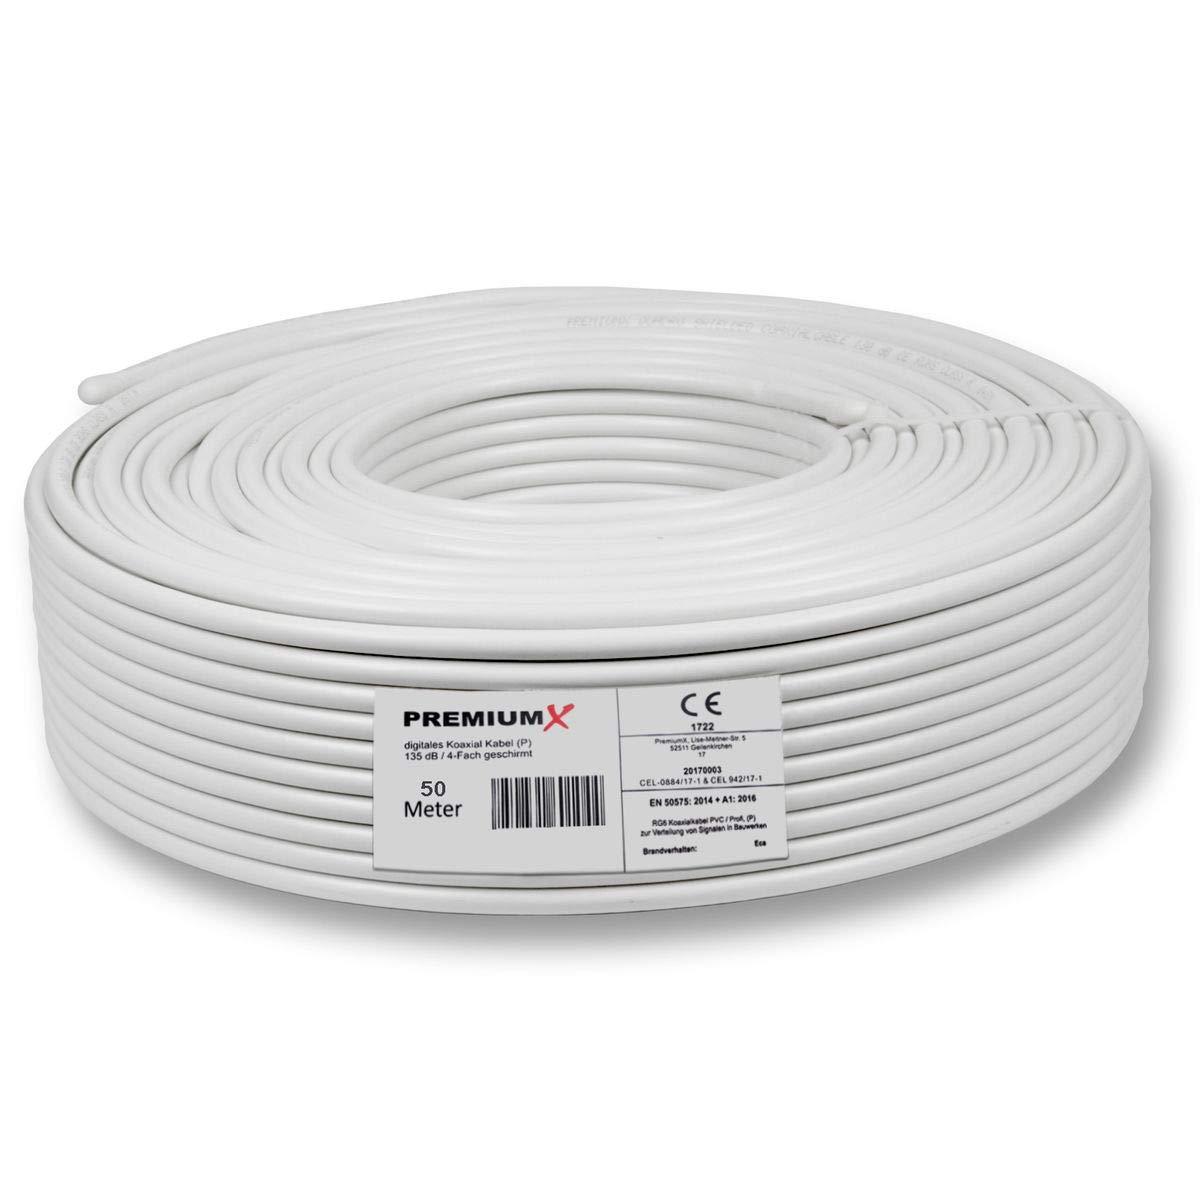 PremiumX - 50m PROFI Sat cable coaxial Cable COAX PURE COBRE 135dB Digital FullHD UltraHD 4K 4 vías blindado para sistemas DVB-S / S2 DVB-C DVB-T y BK ...